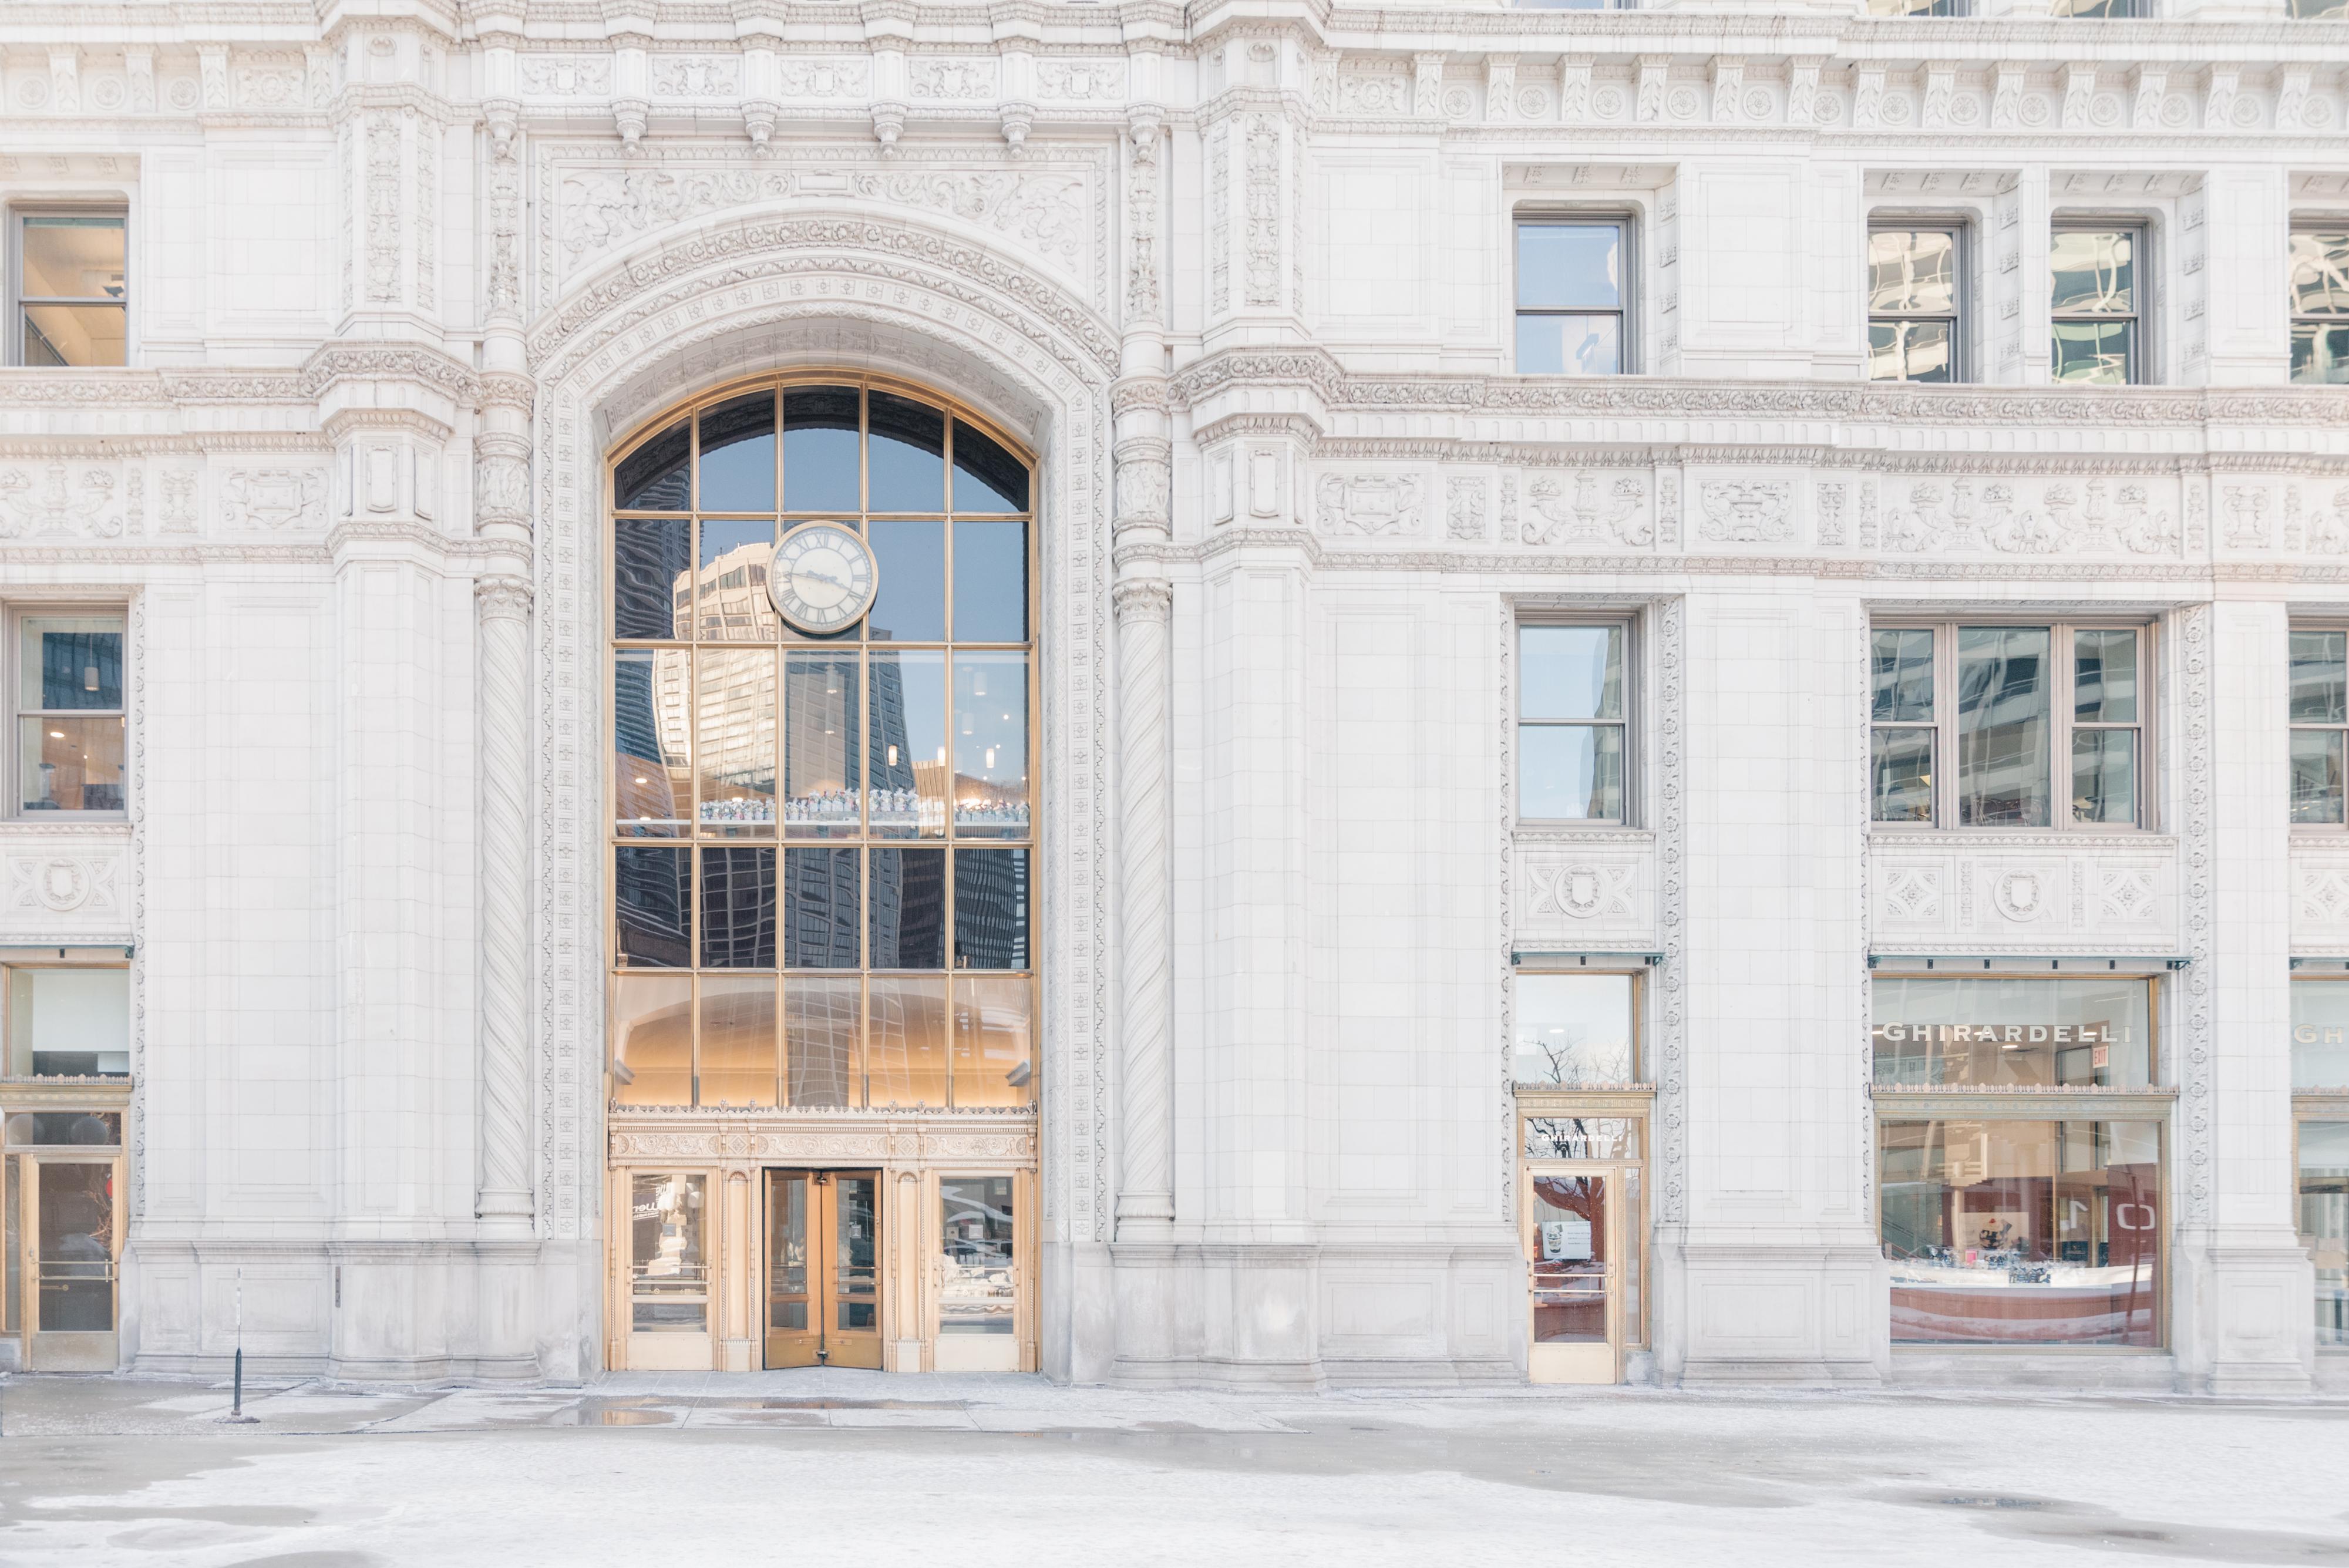 Chicago's Wrigley Building Winter 2021